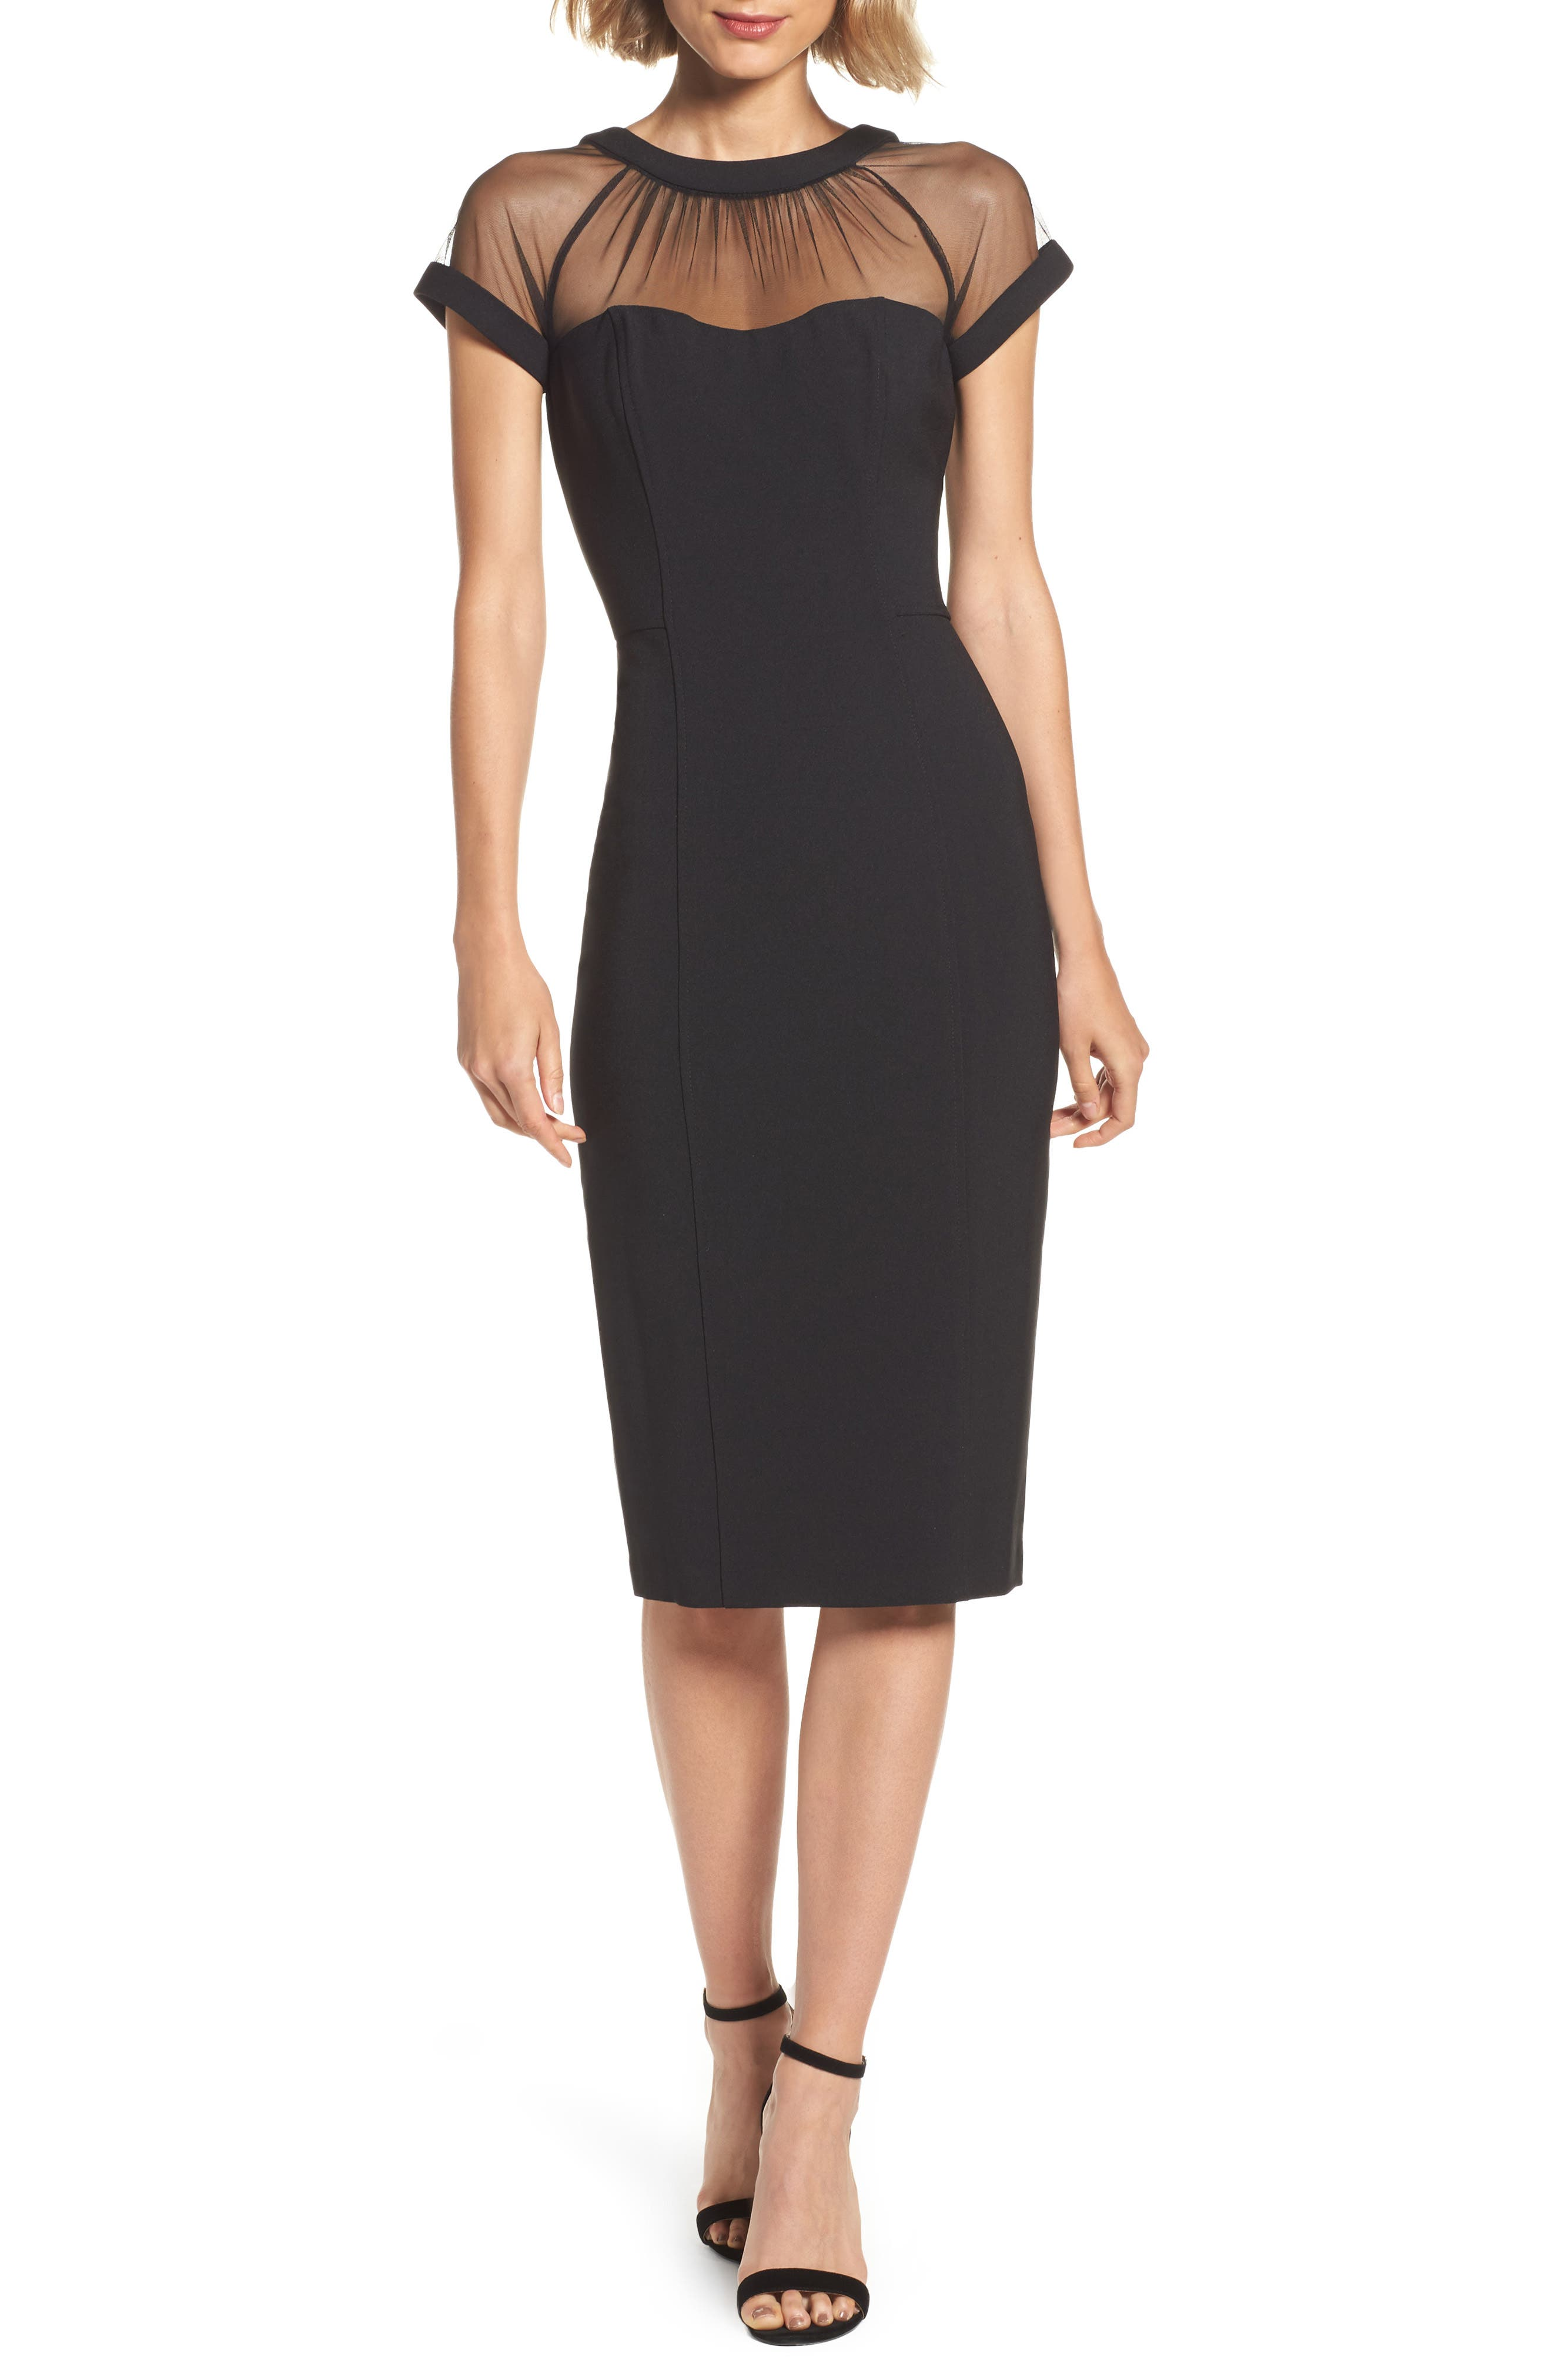 36c2caa5592 Women s Knee-Length Dresses